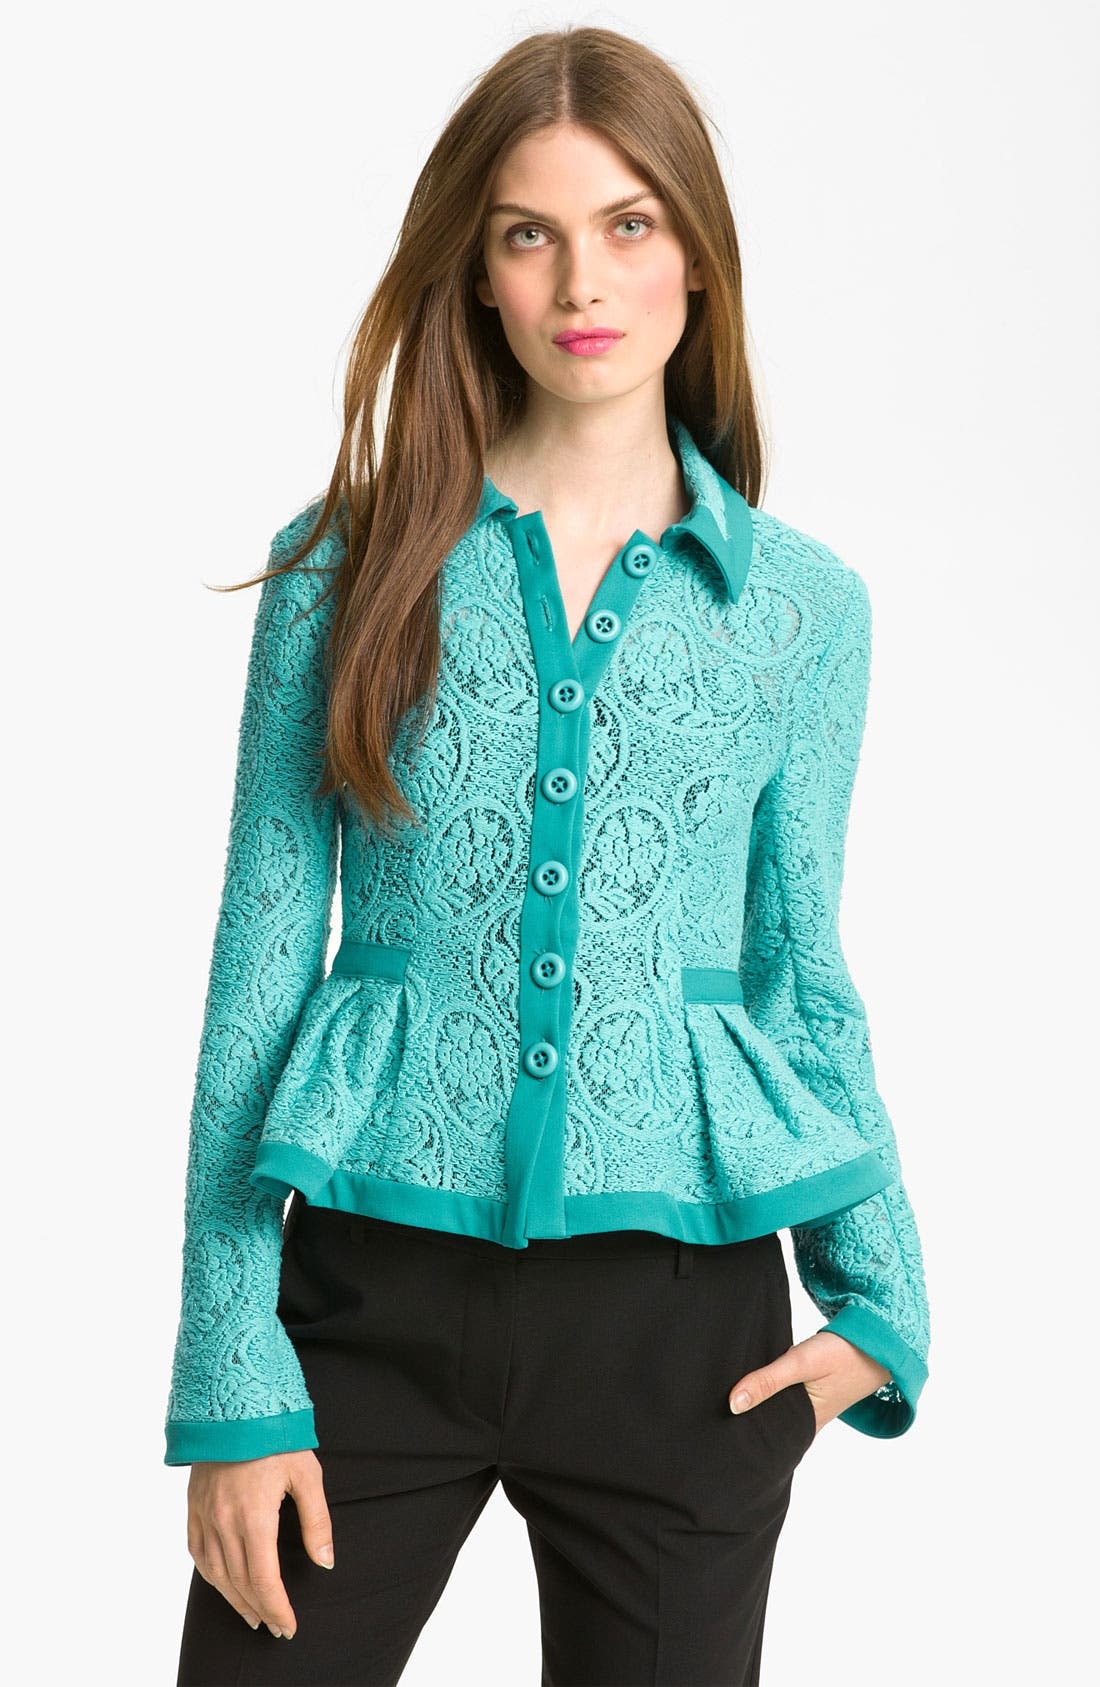 Main Image - Nanette Lepore 'Summer Flame' Lace Jacket